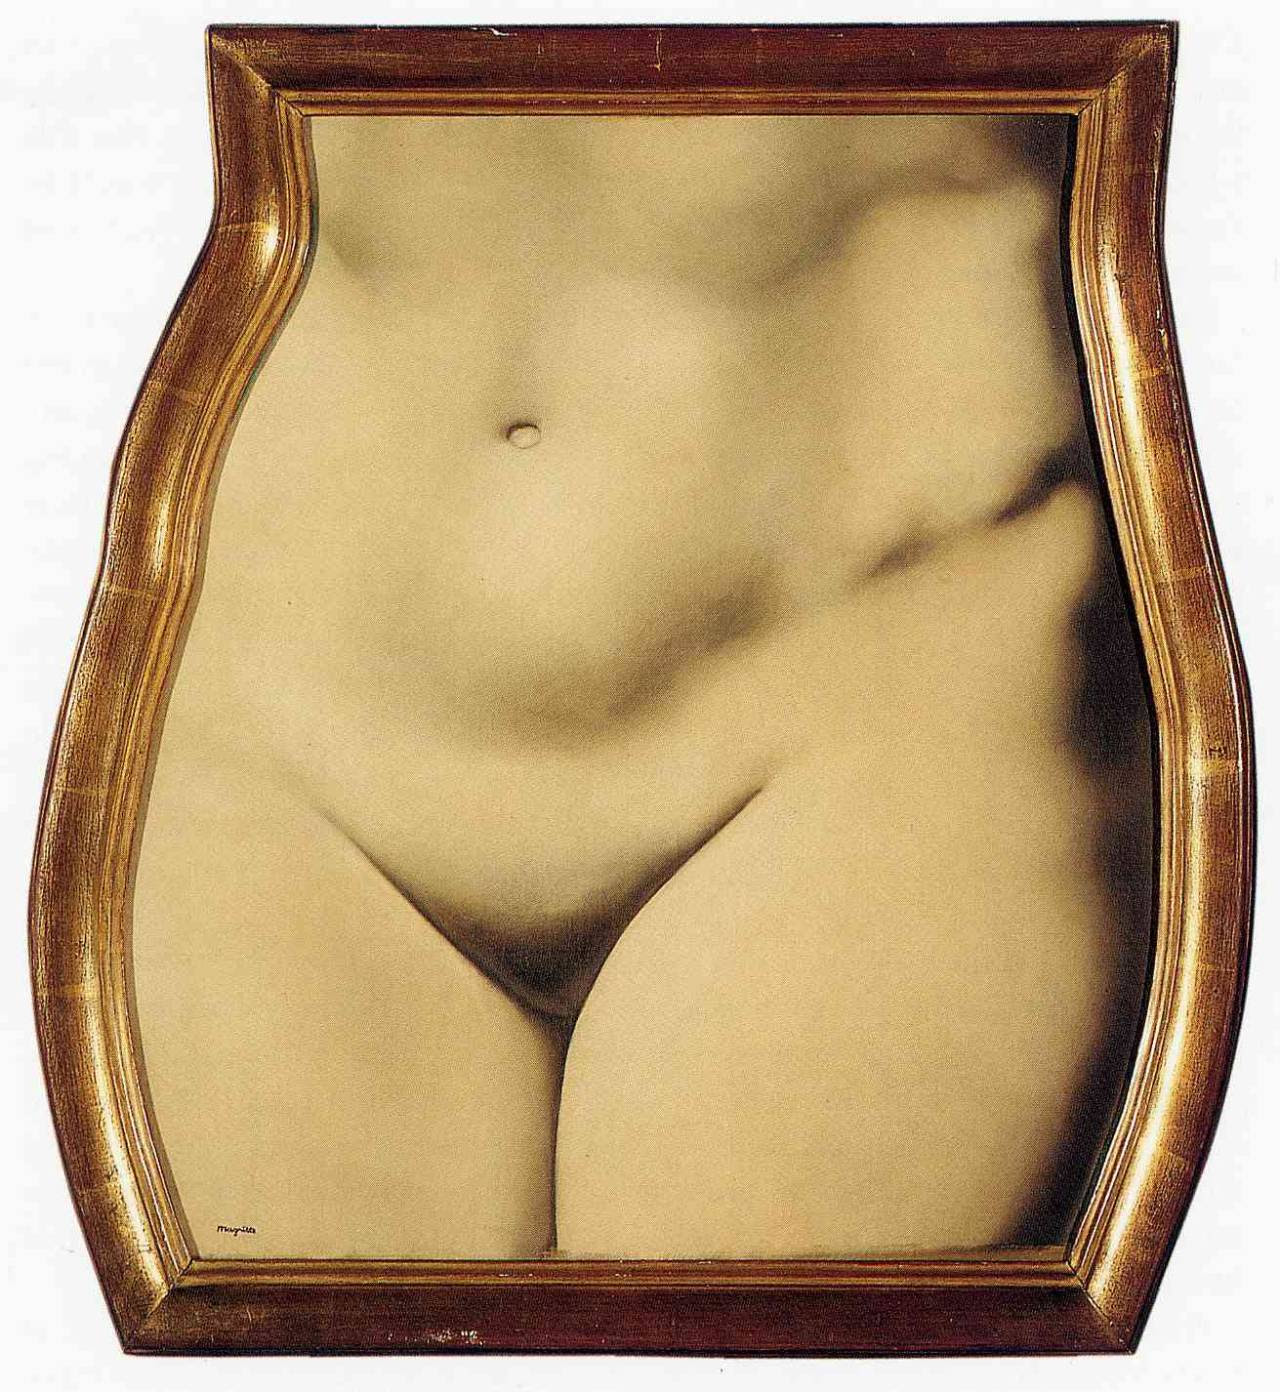 Representation,1937 Rene Magritte